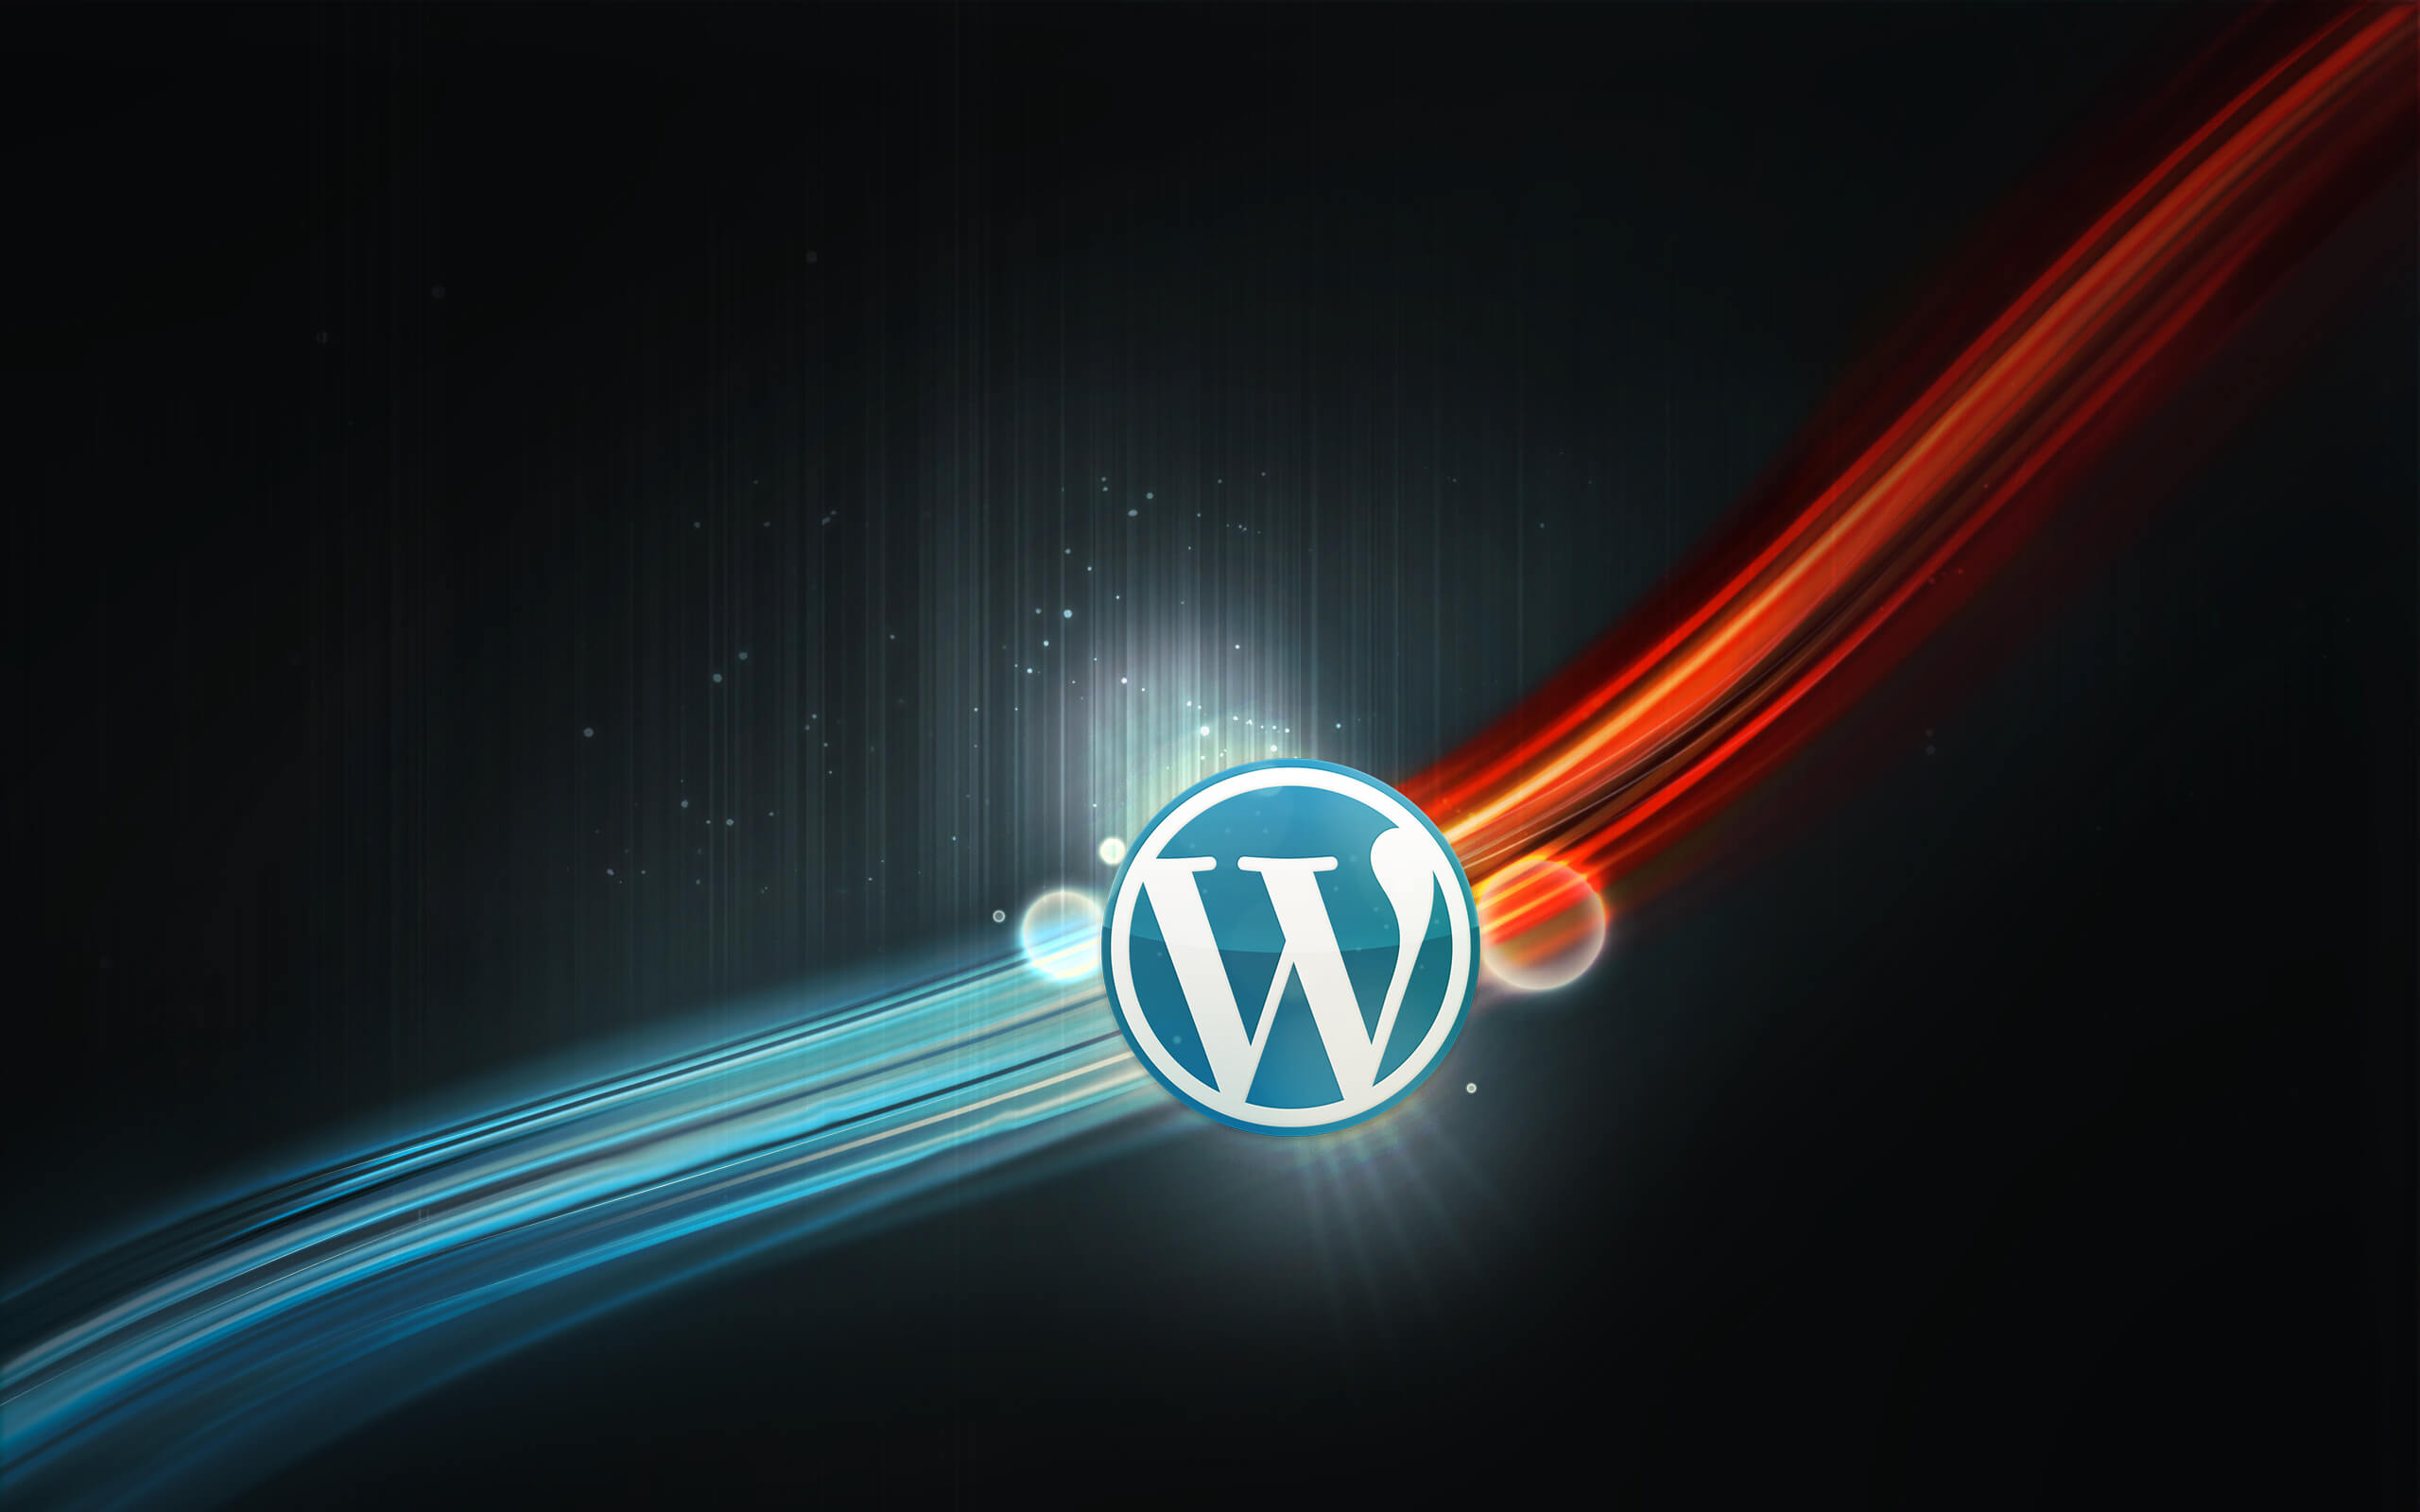 Wordpress wallpaper 3 - WordPress WallPapers